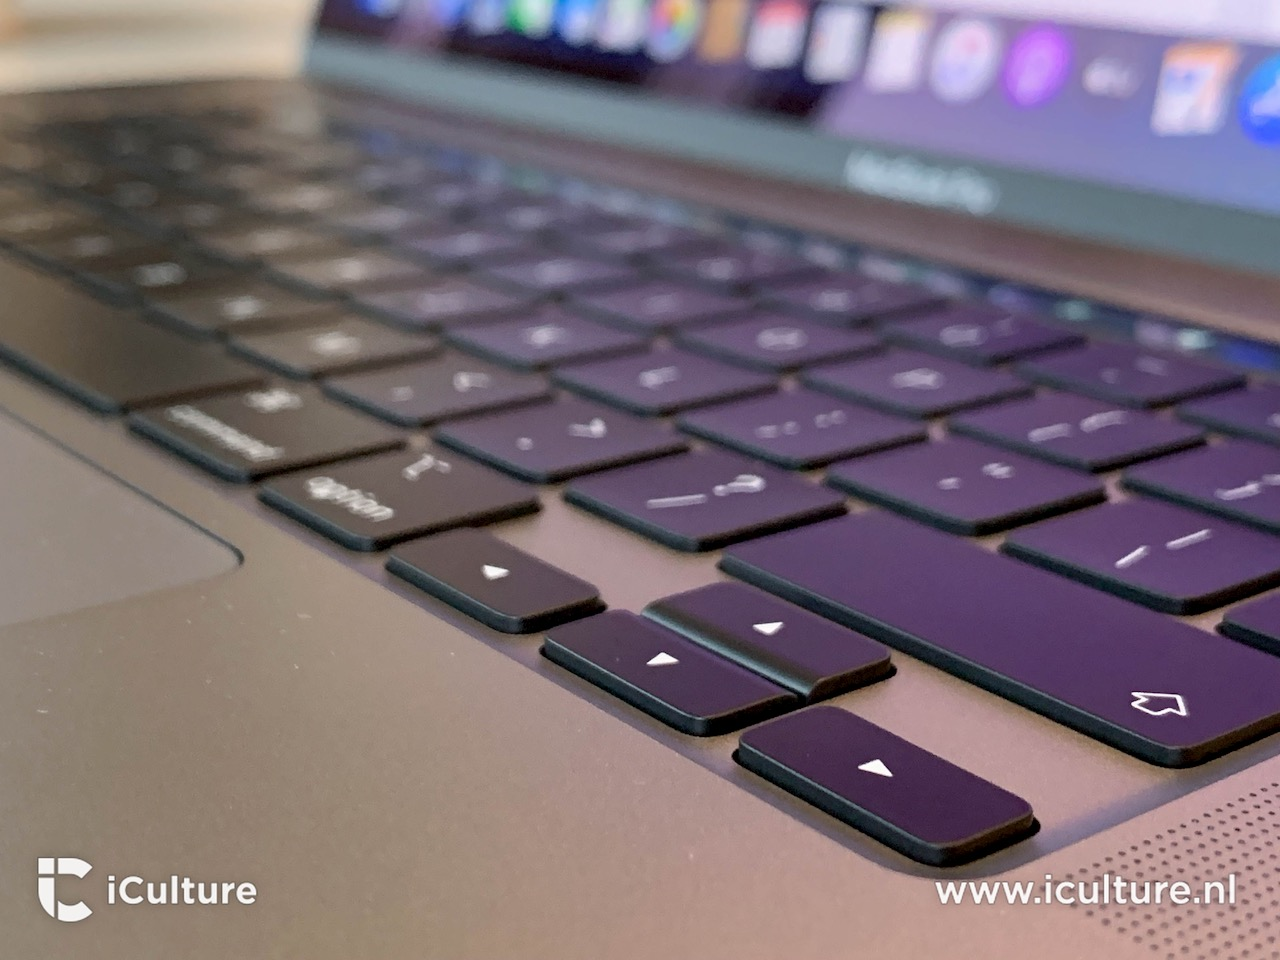 MacBook Pro 16-inch toetsenbord pijltjestoetsen